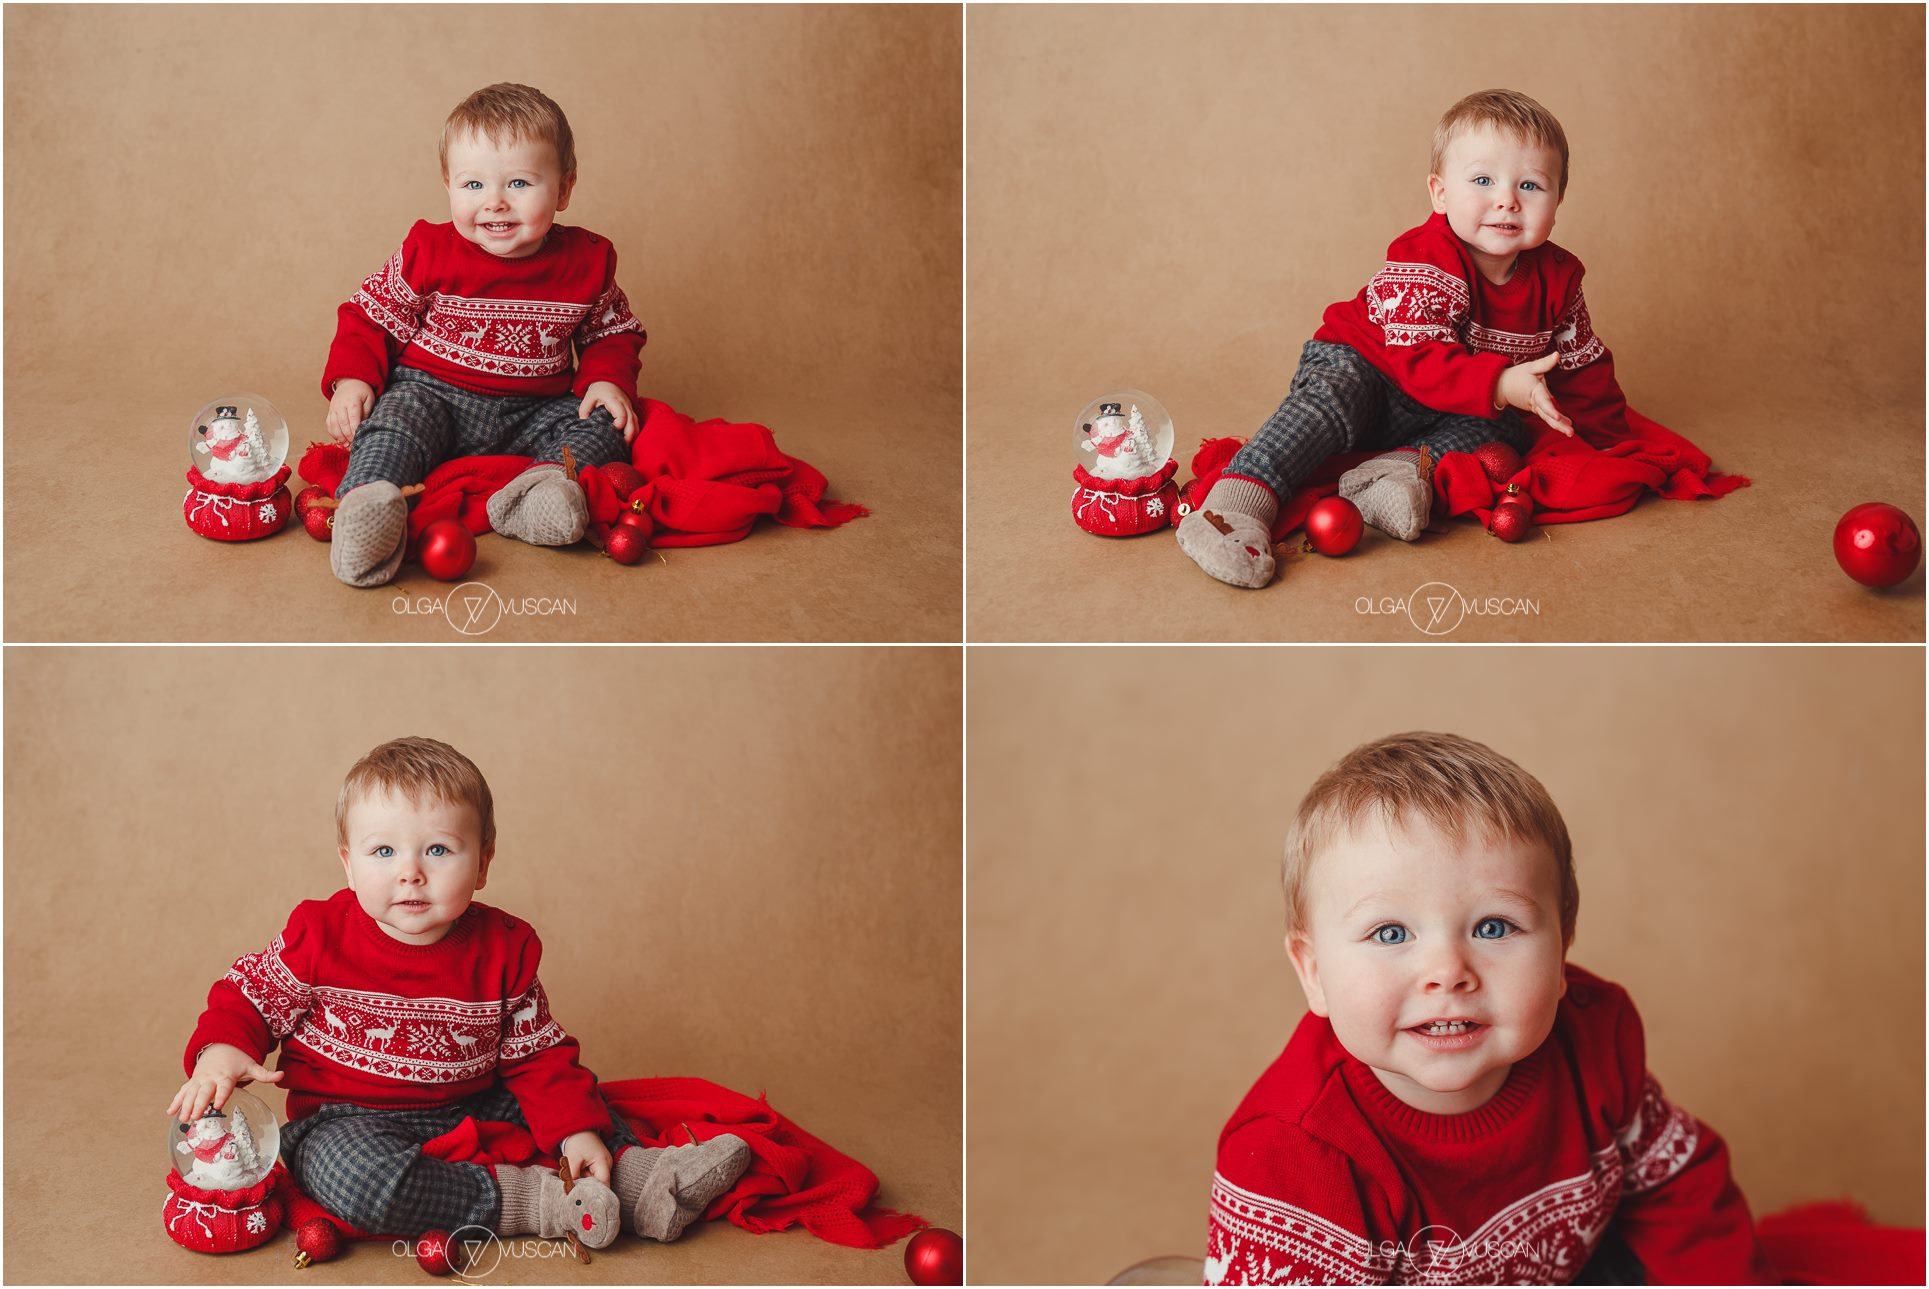 sedinta foto 1 an, fotograf copii Cluj, poze aniversare 1 an, sesiune foto aniversara 1 an, fotograf profesionist copii